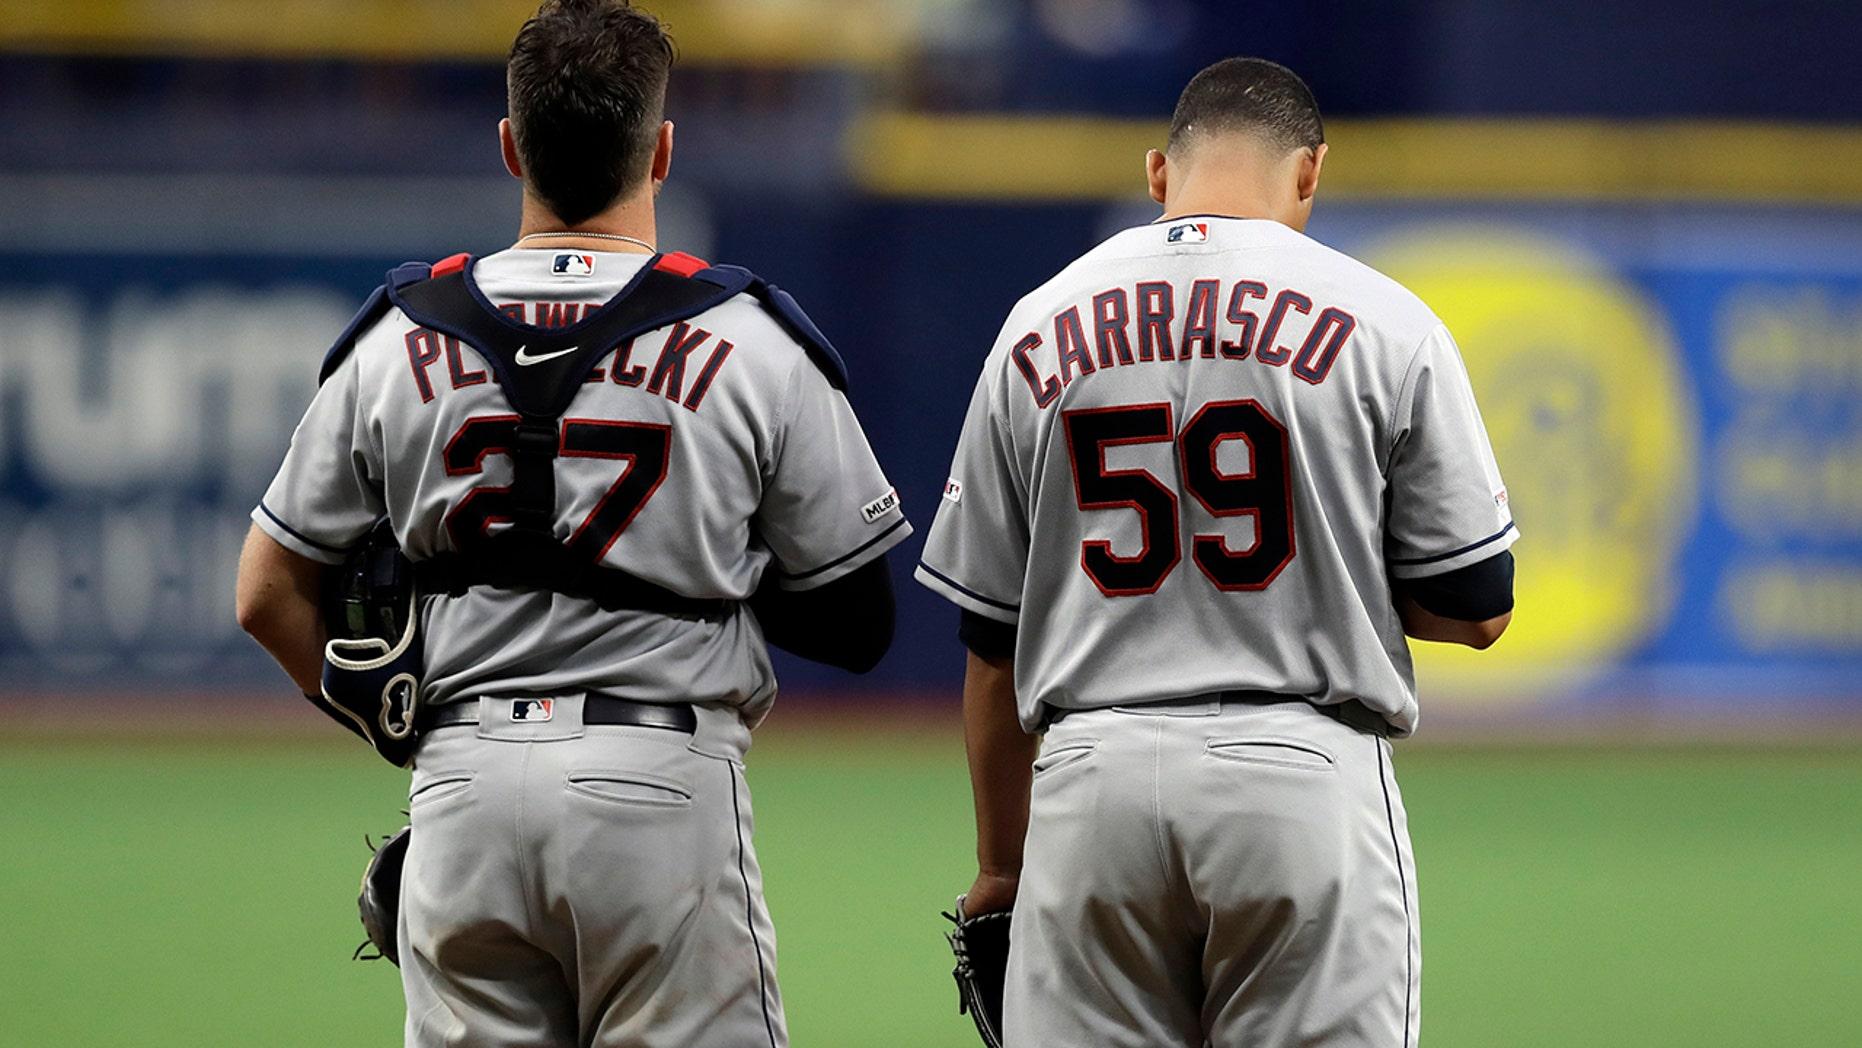 Indians Pitcher Carrasco Cheered In Return From Leukemia Fox News